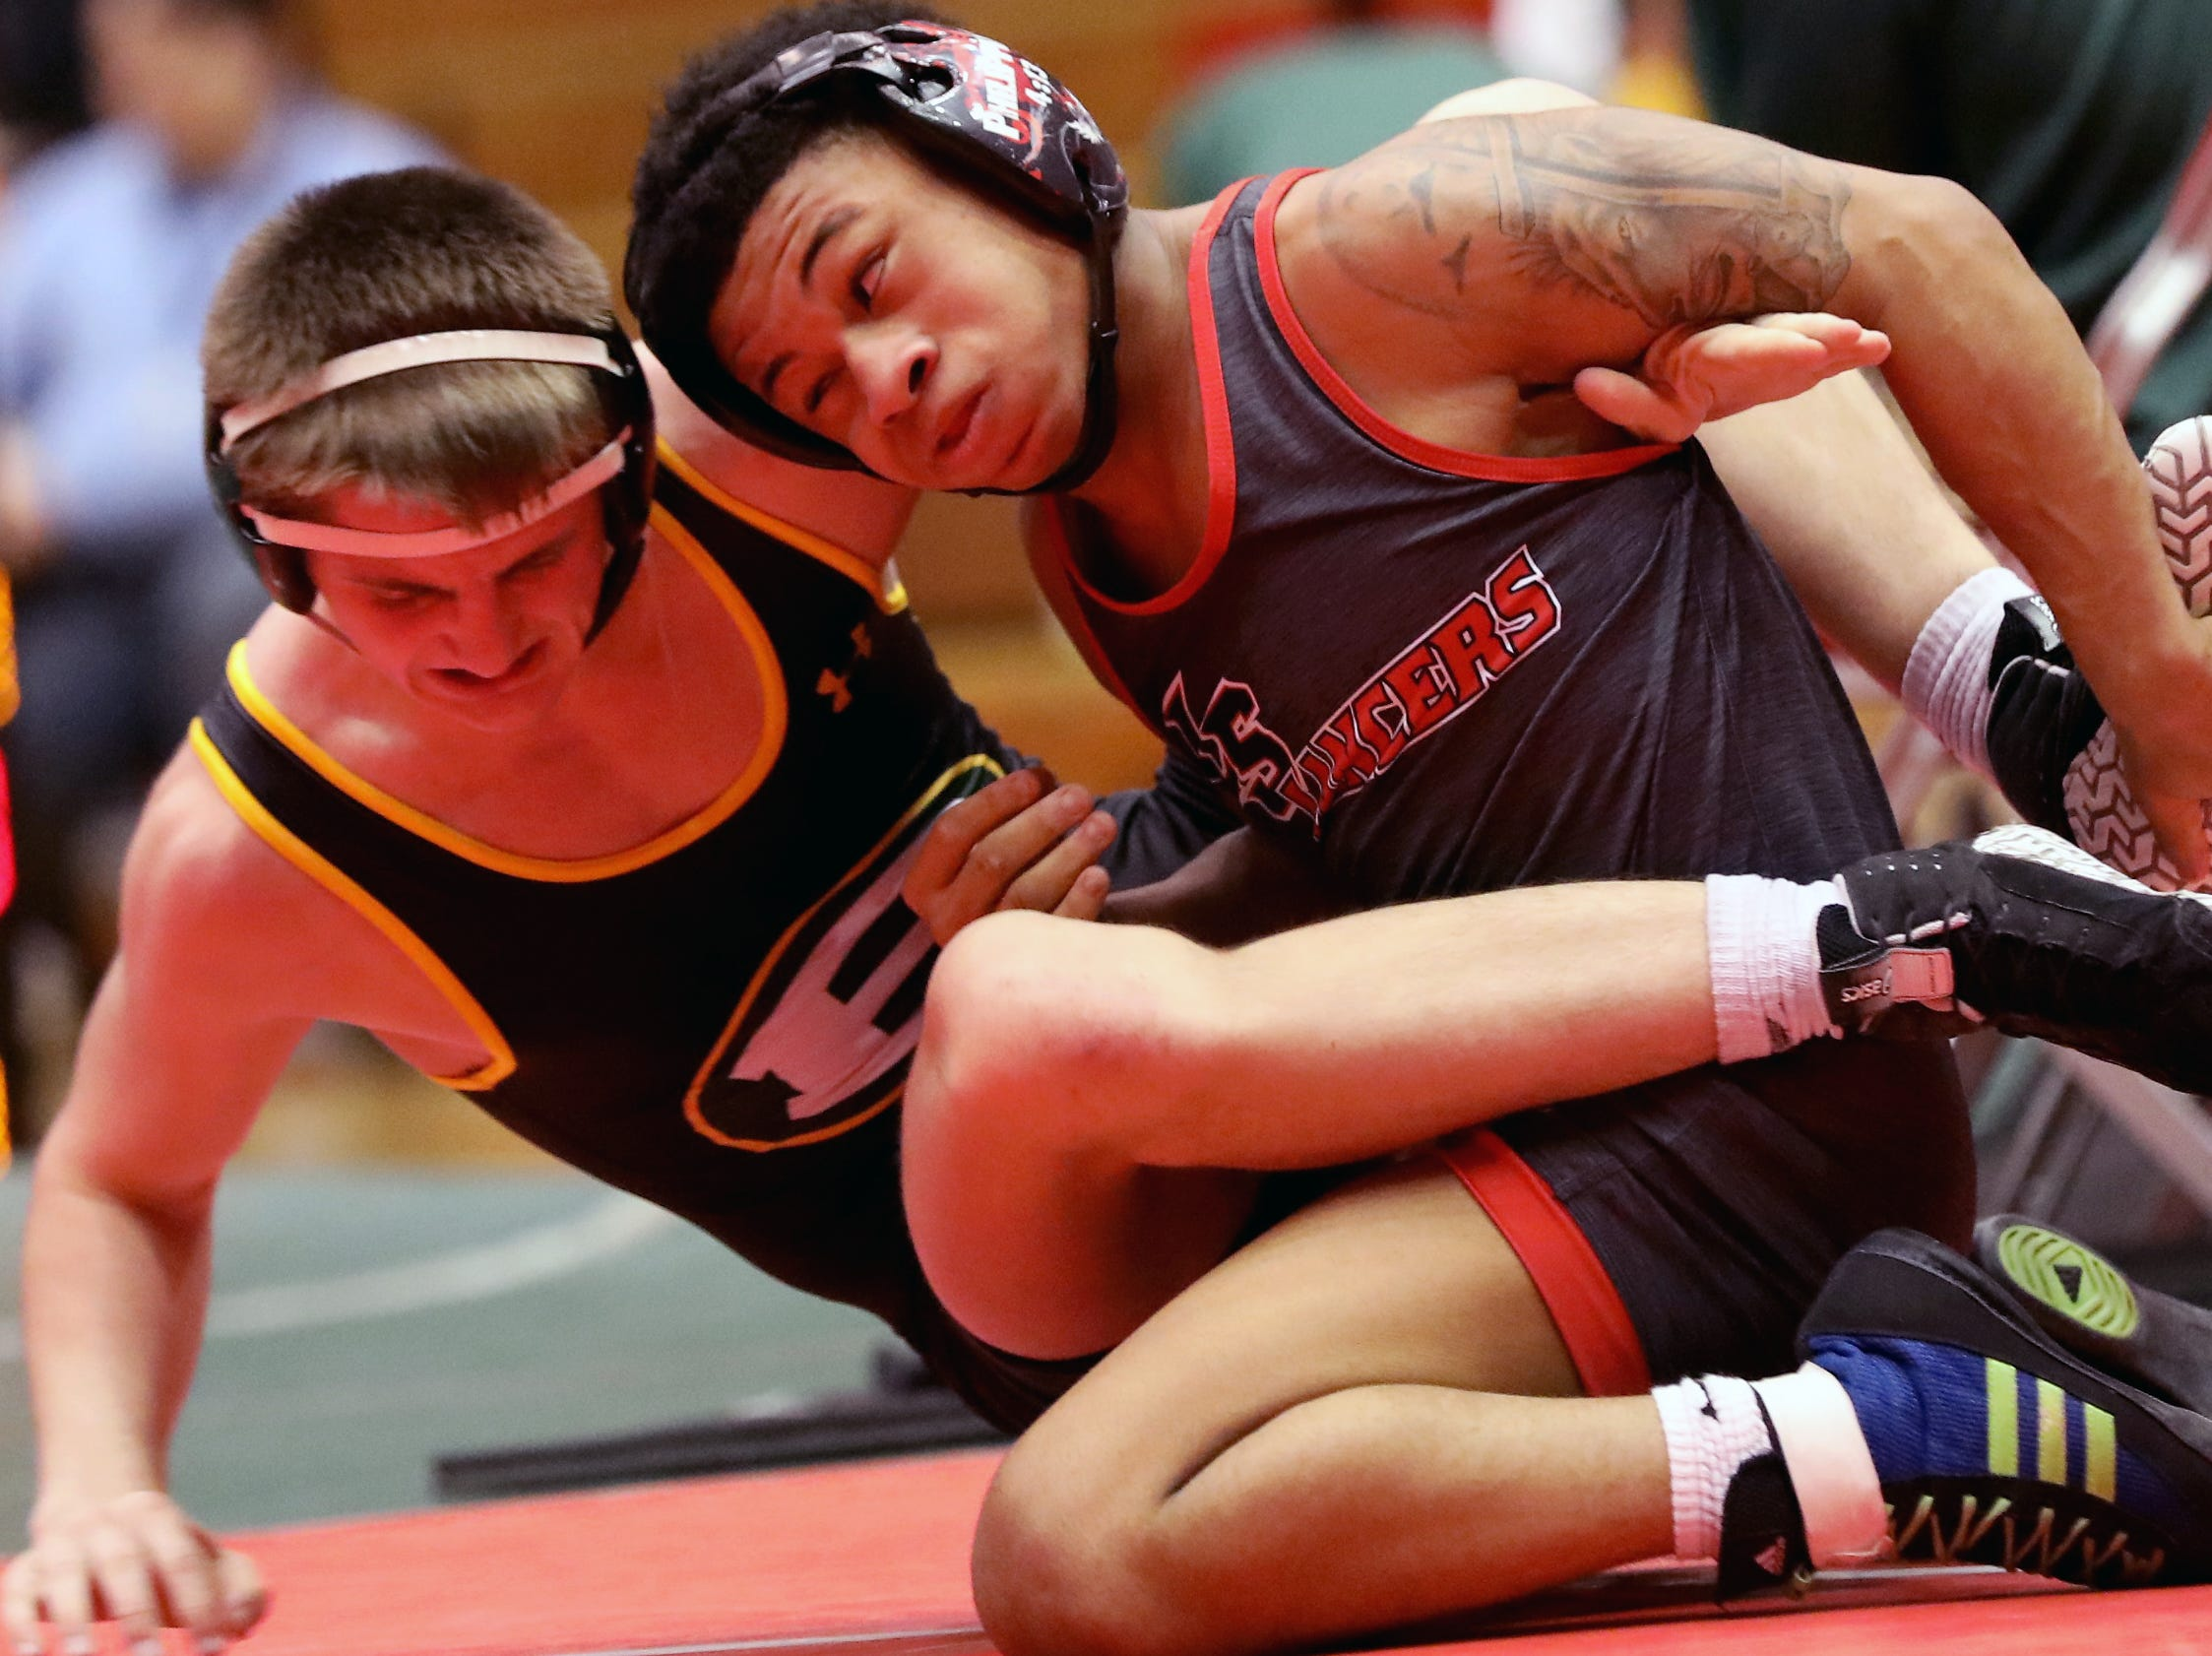 La Salle wrestler Casey Wiles battles  Lakewood St. Edward wrestler Scot Richter during the state dual wrestling meet in Columbus, Ohio, Sunday, Feb. 10, 2019.